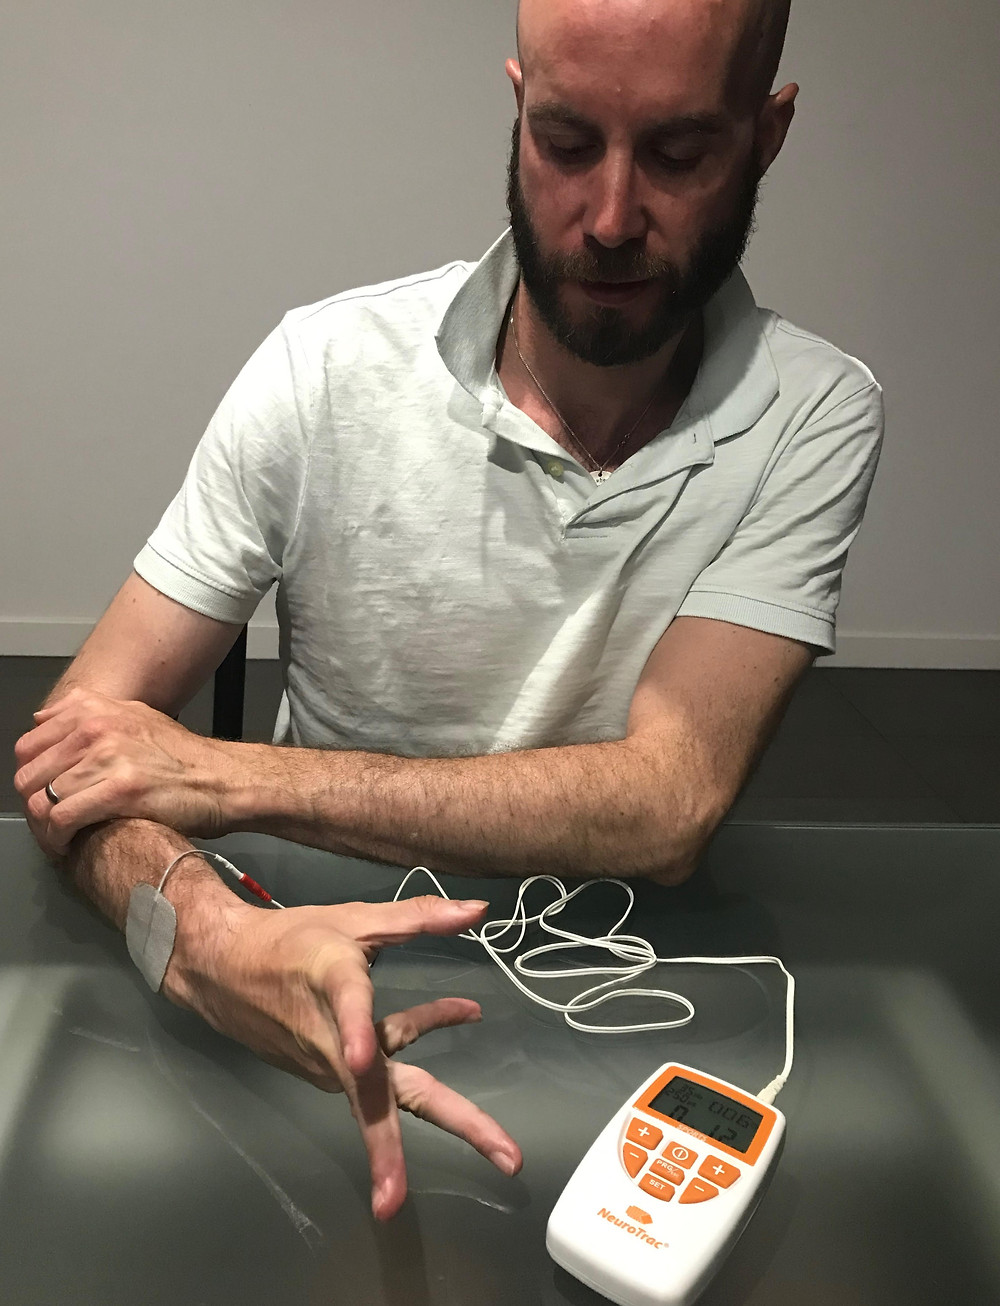 My electrical muscle stimulation machine